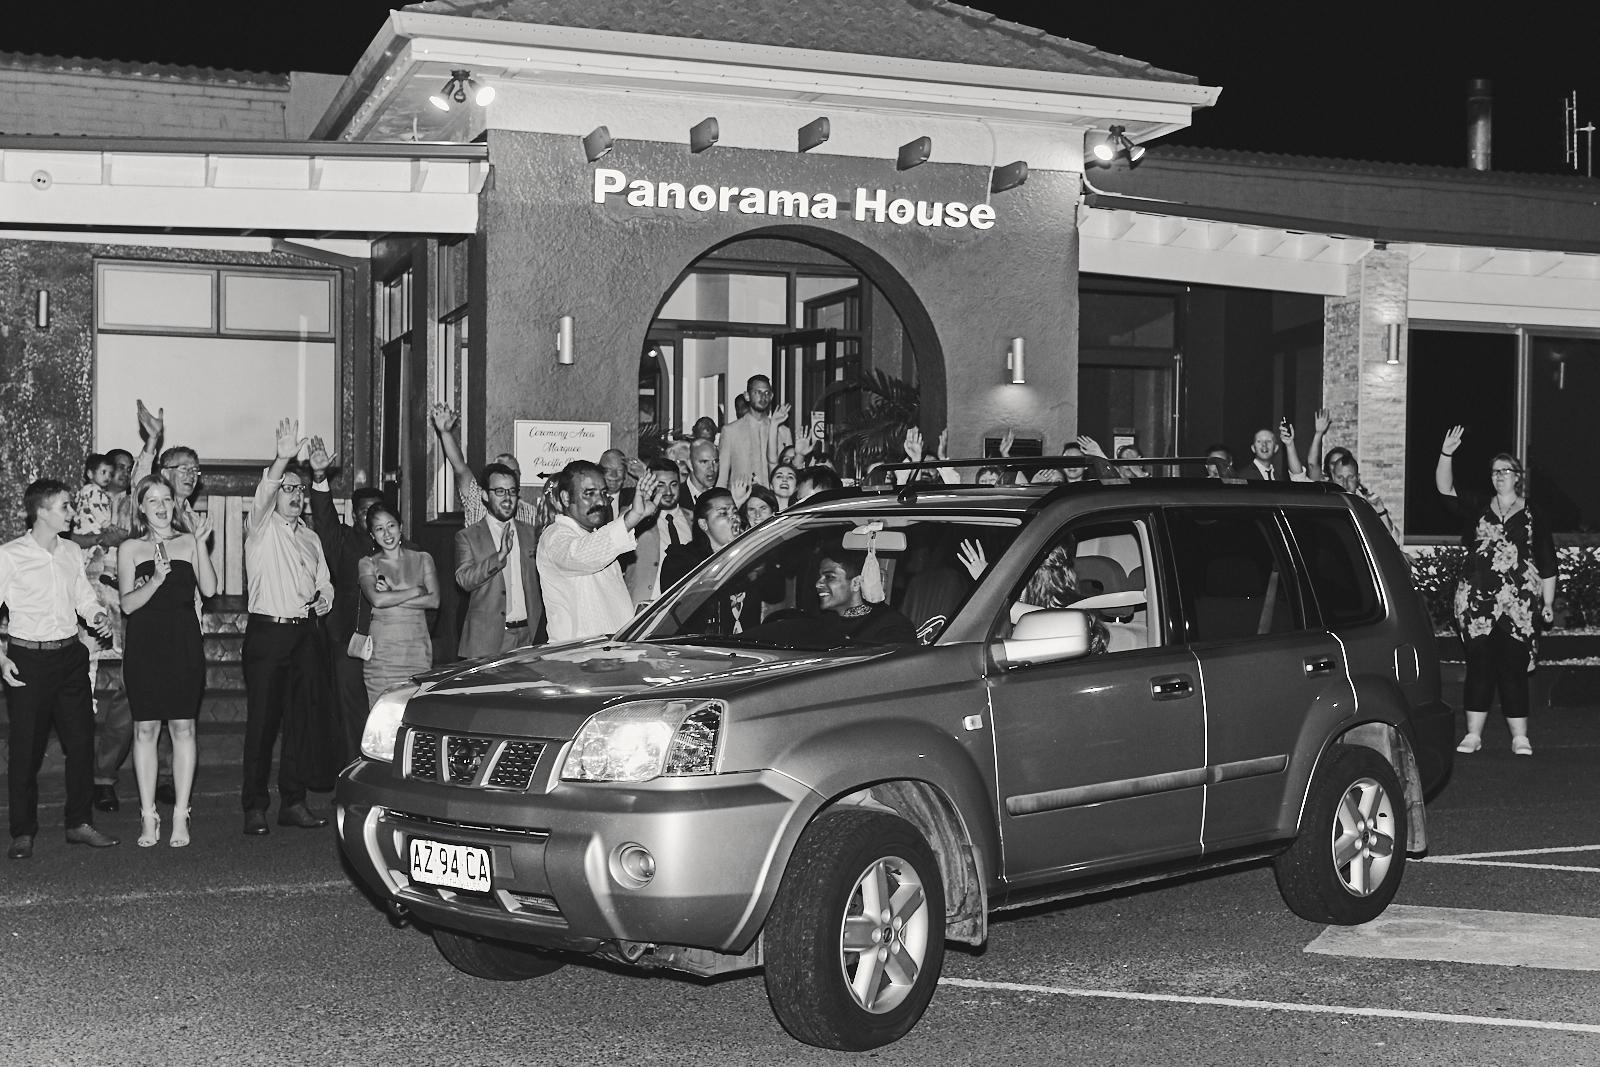 panorama-house-bulli_666.jpg